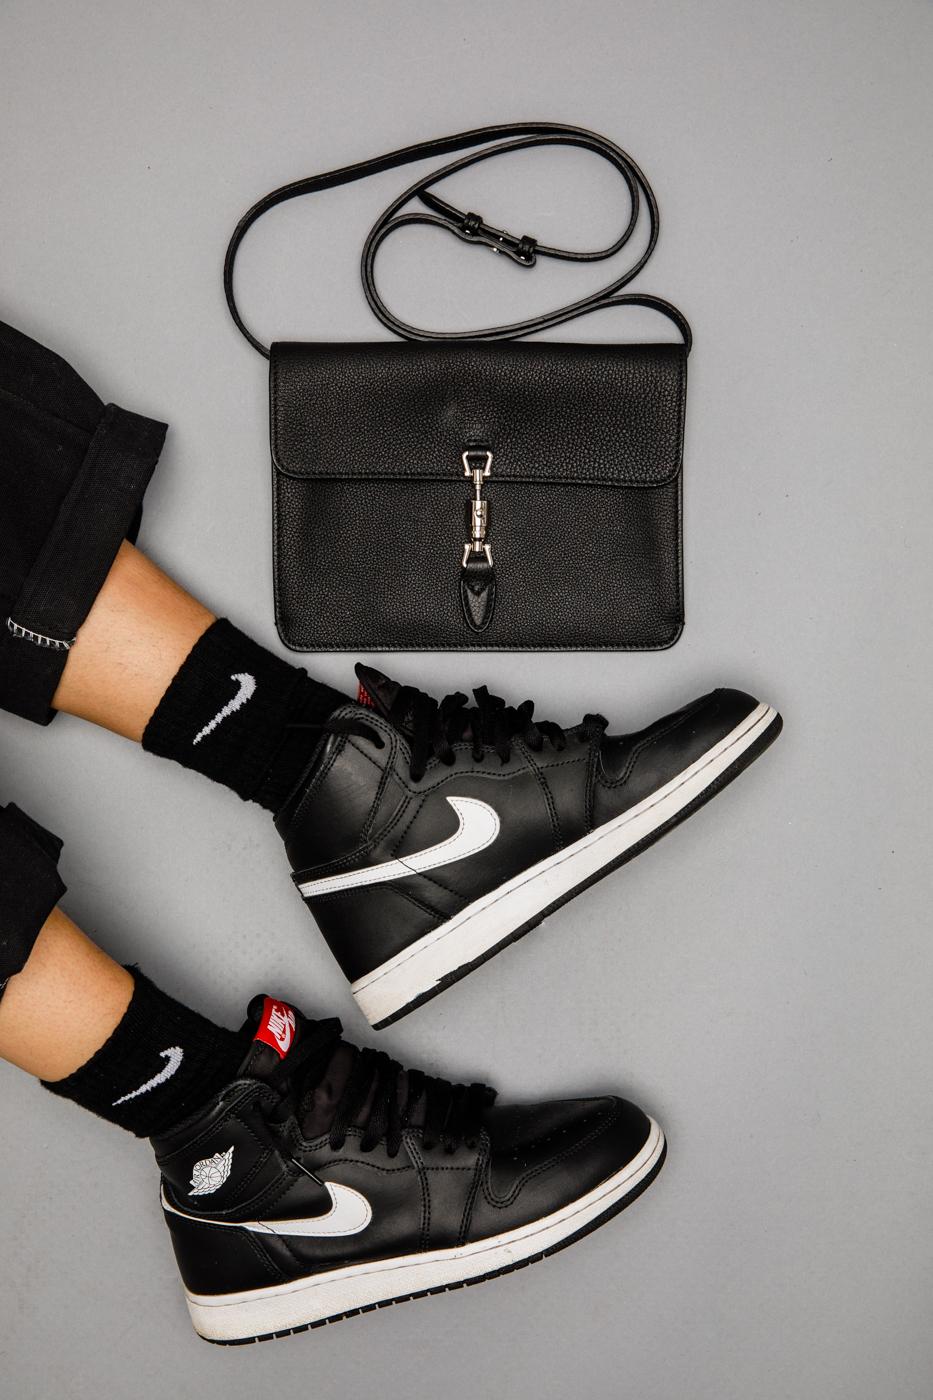 huge discount 7e97b 4cddd With a baby Louis Vuitton under your underarm, you know you need classic white  Jordan kicks to match. Sneaker  Jordan 1 Retro Yin Yang Black